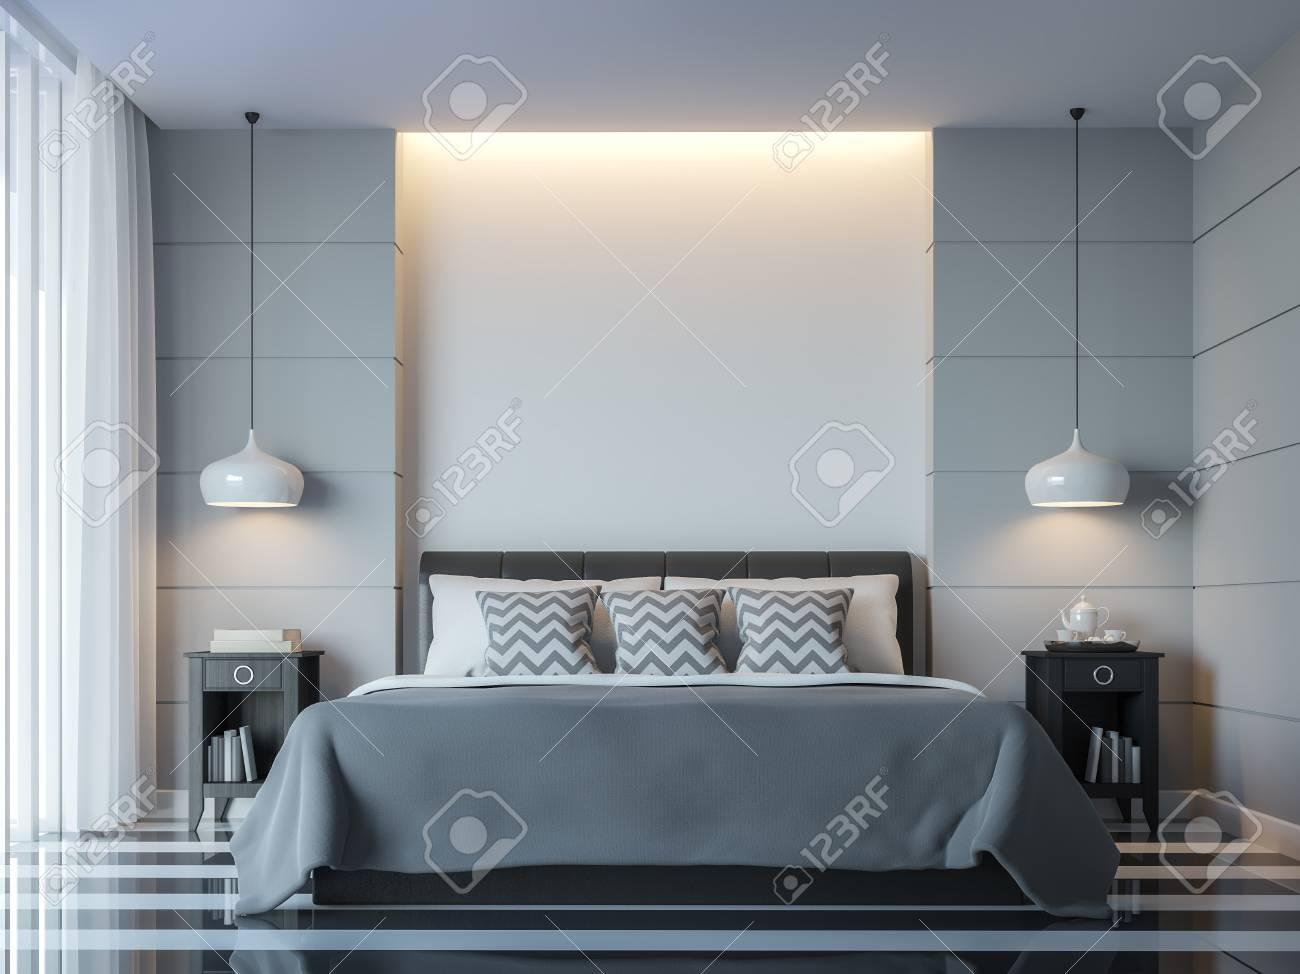 Chambre A Coucher Blanche Moderne Style Minimal Rendu 3d Image